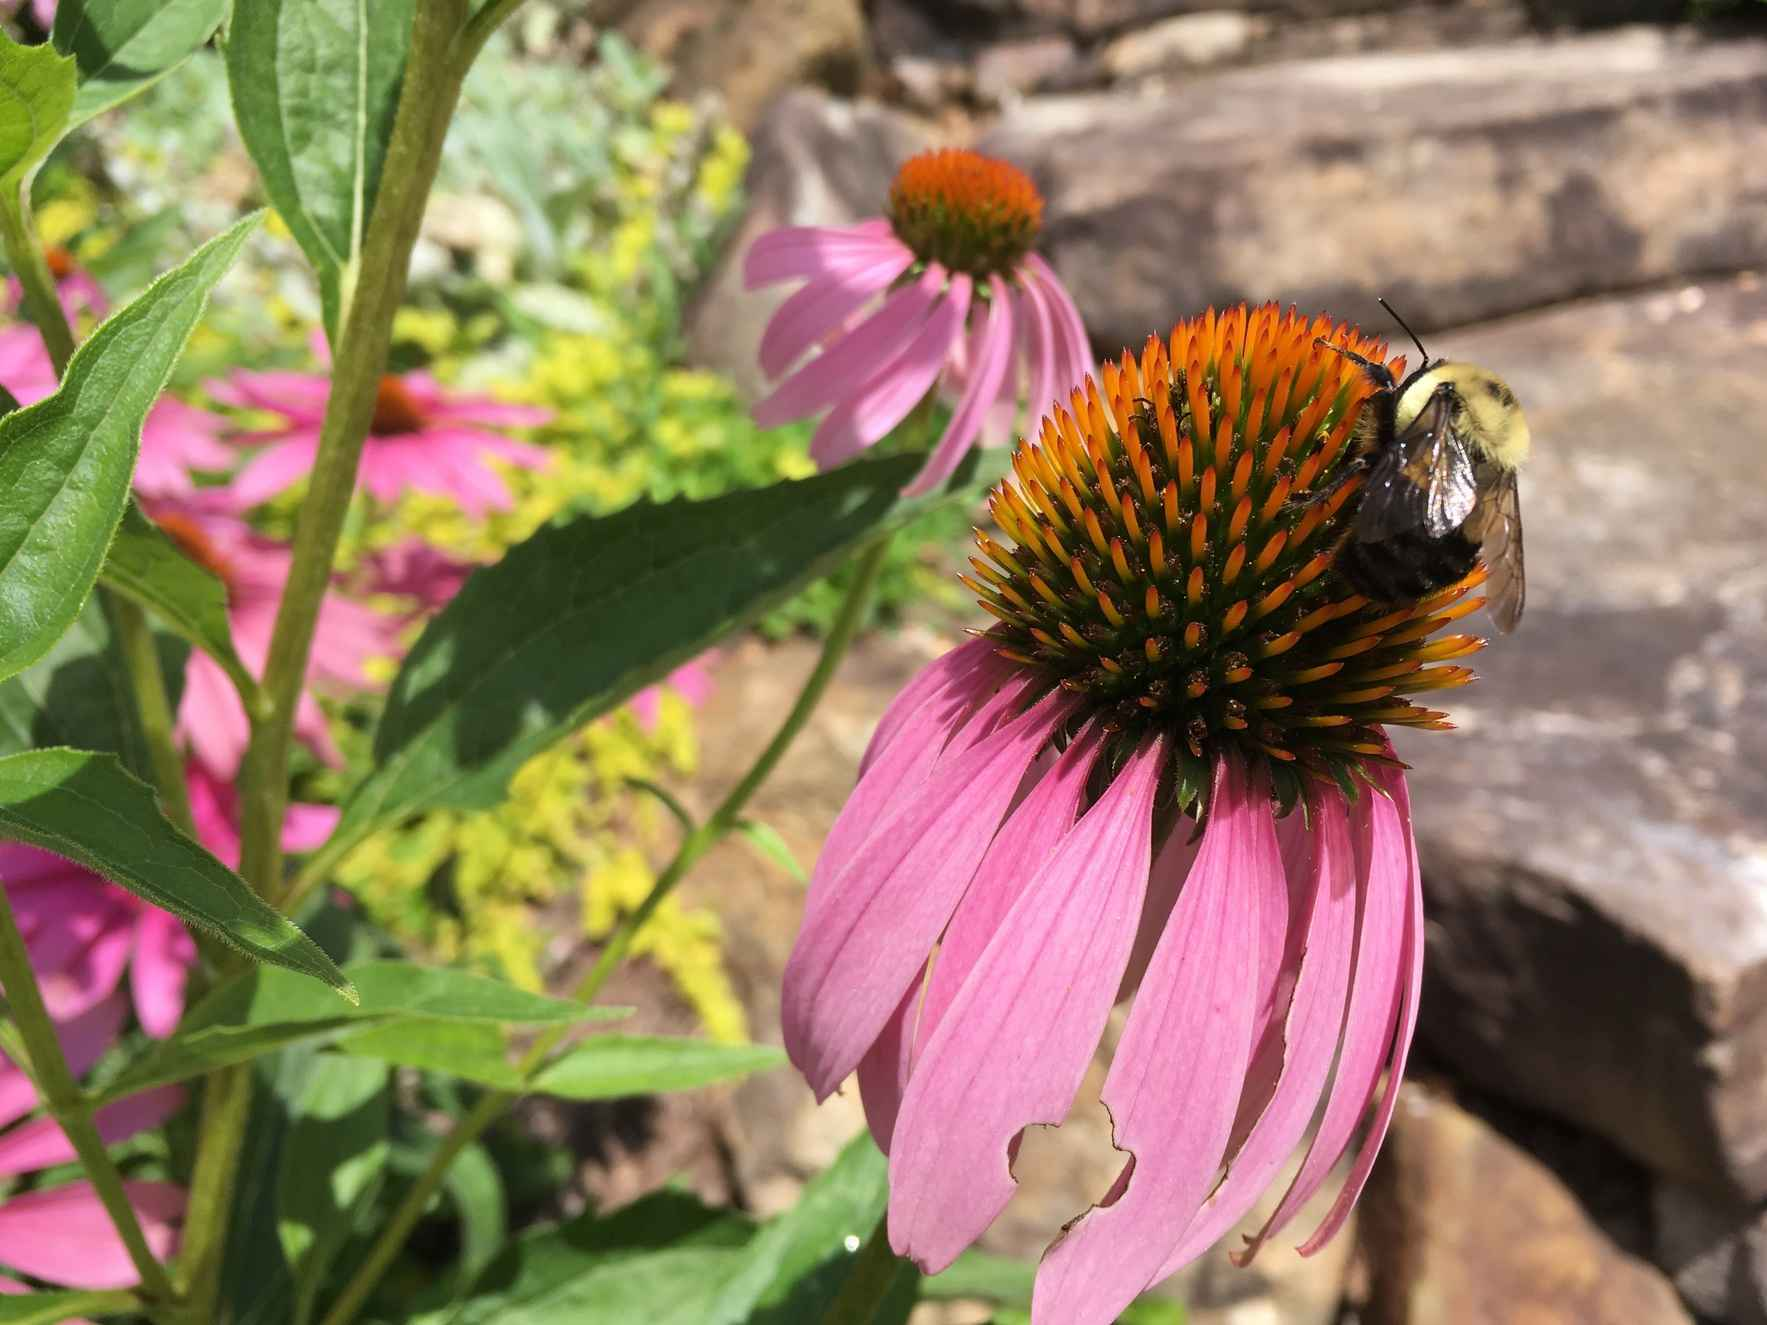 Inspiring our community, raising awareness, and increasing pollinator habitat through garden certification. image